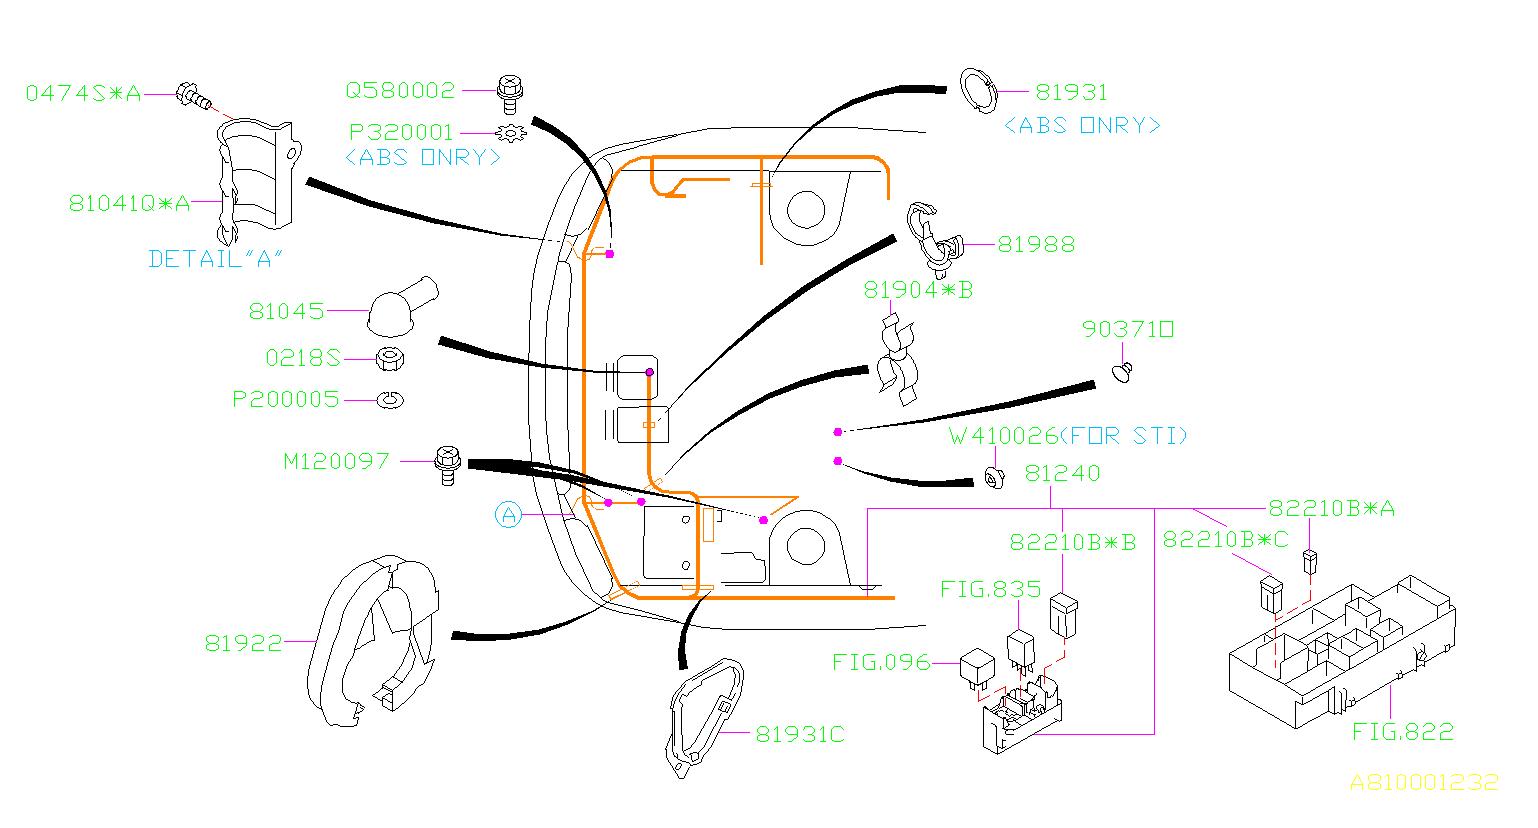 Subaru Sti Clamp Altr Harness  Wiring  Main  Front